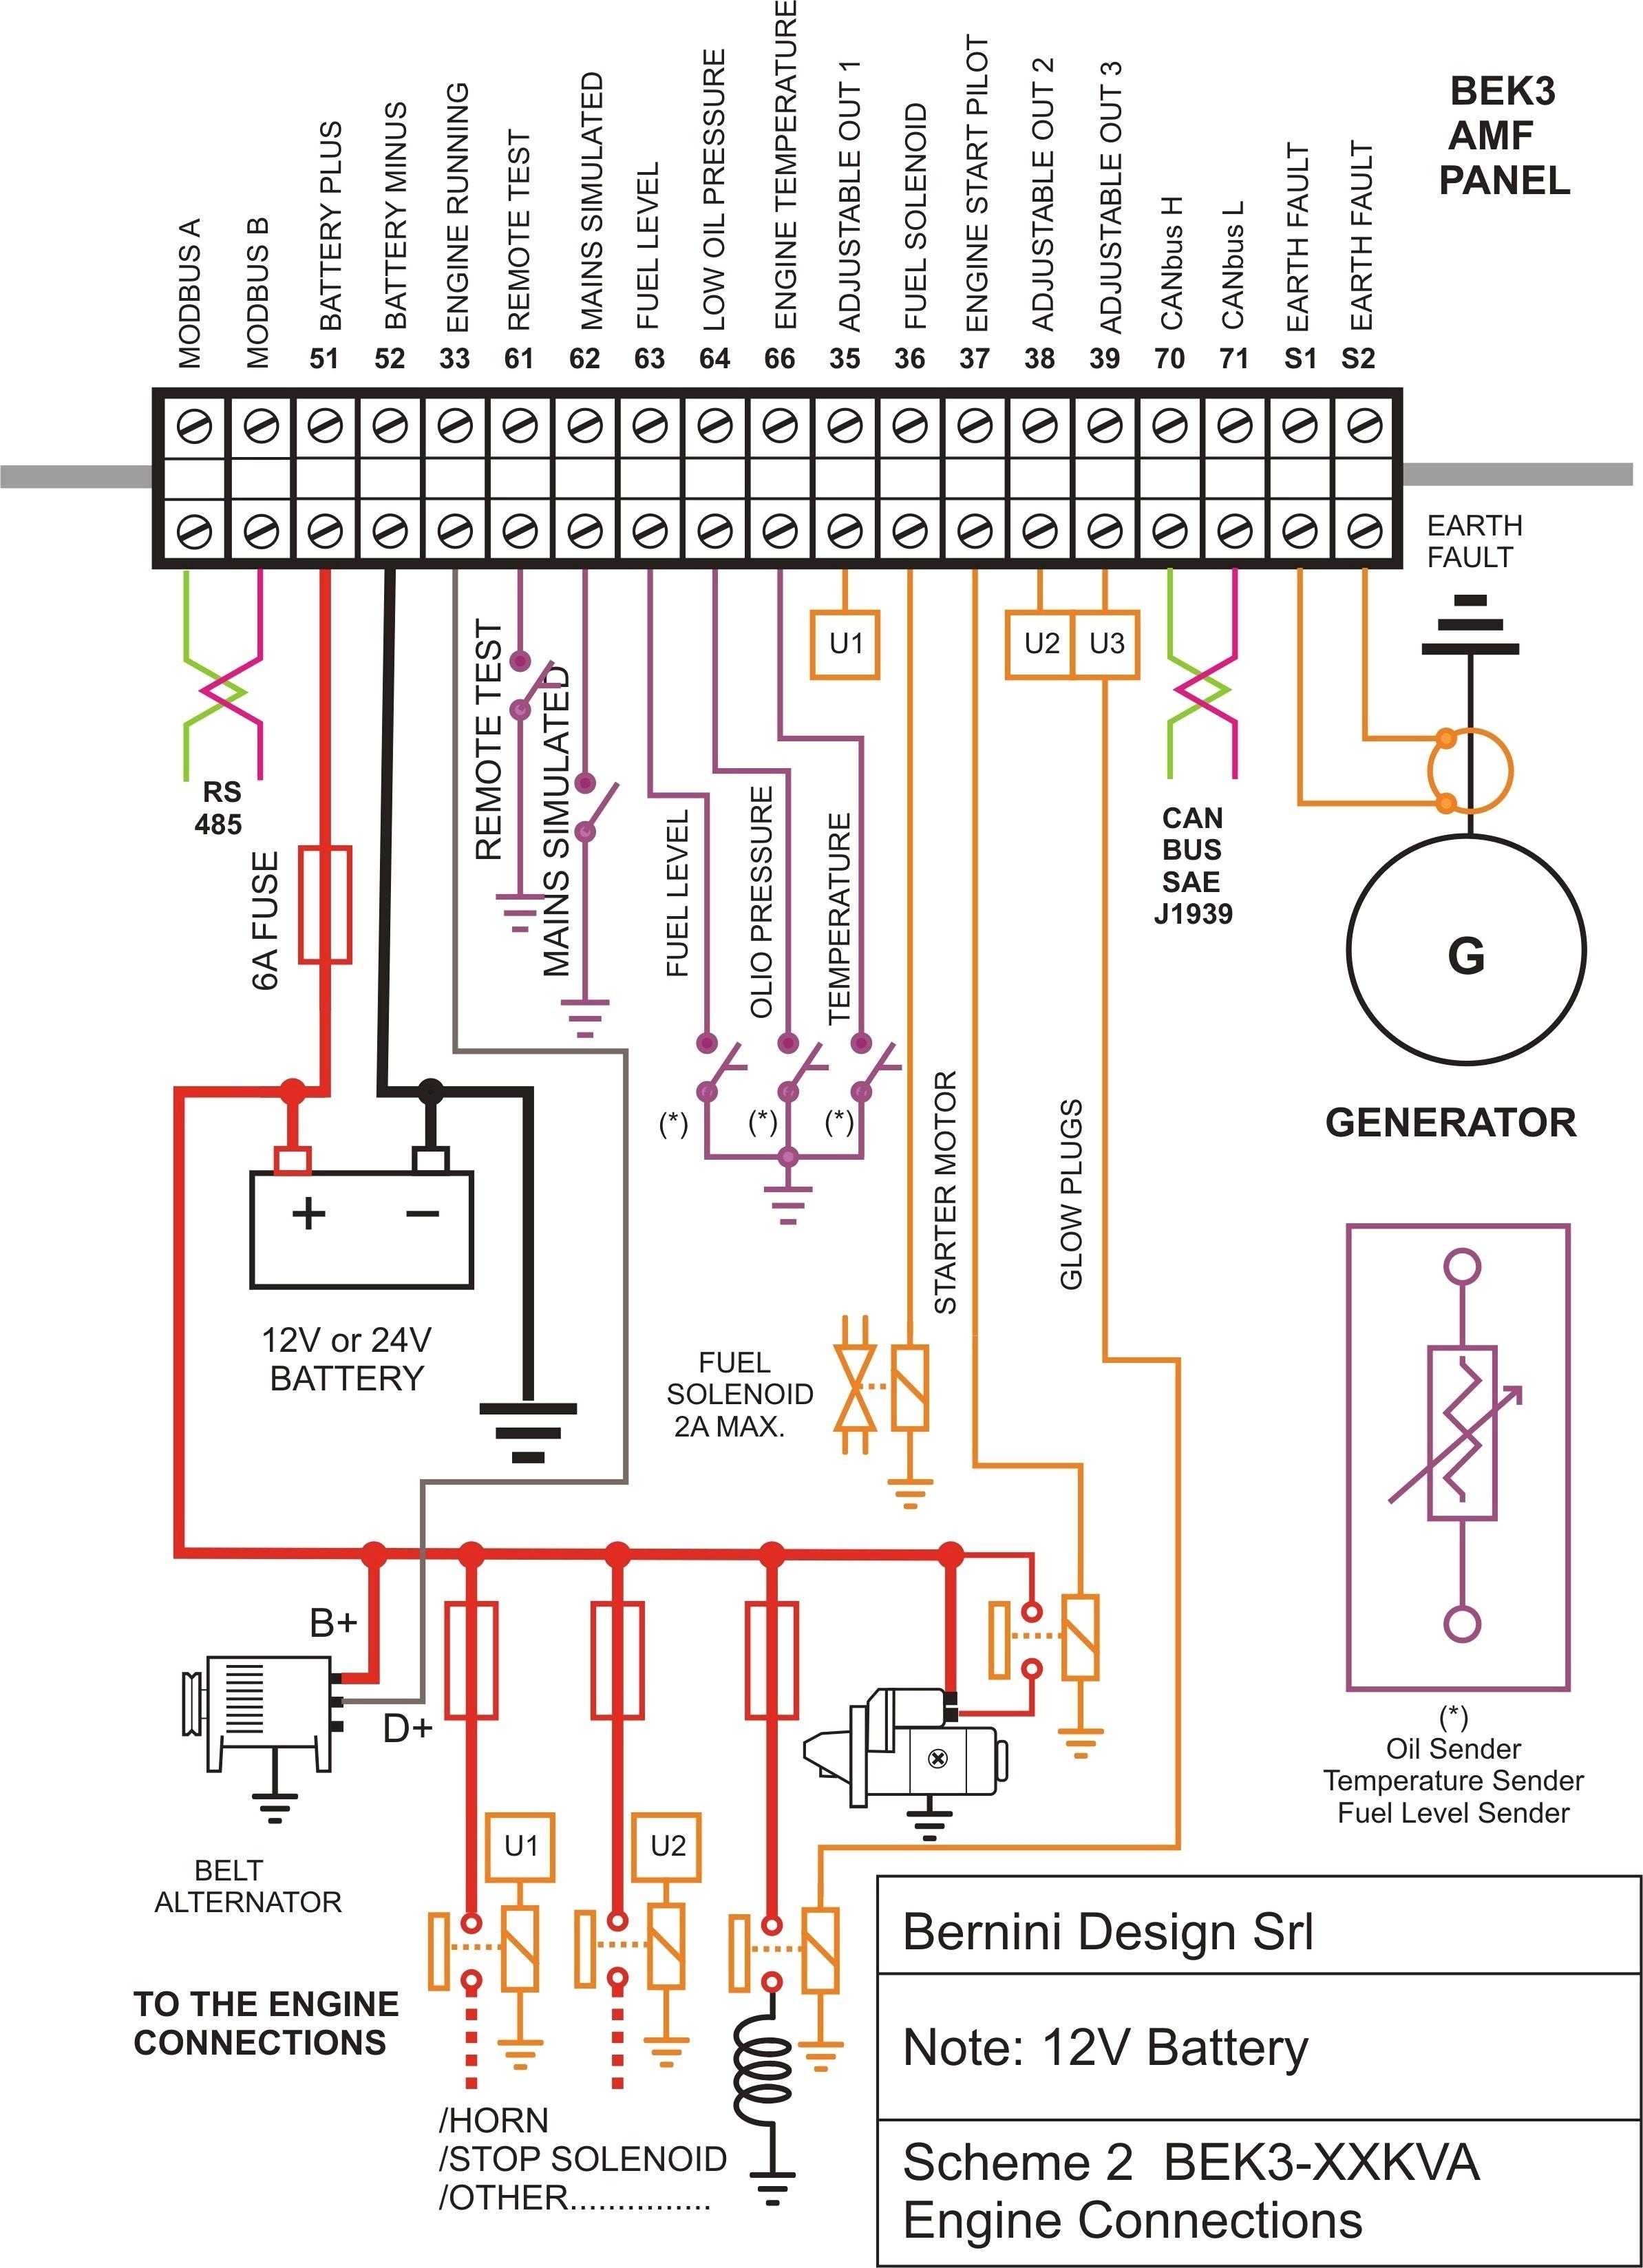 Free Car Wiring Diagrams House Wiring Diagram App Best Wiring Diagram Of Free Car Wiring Diagrams